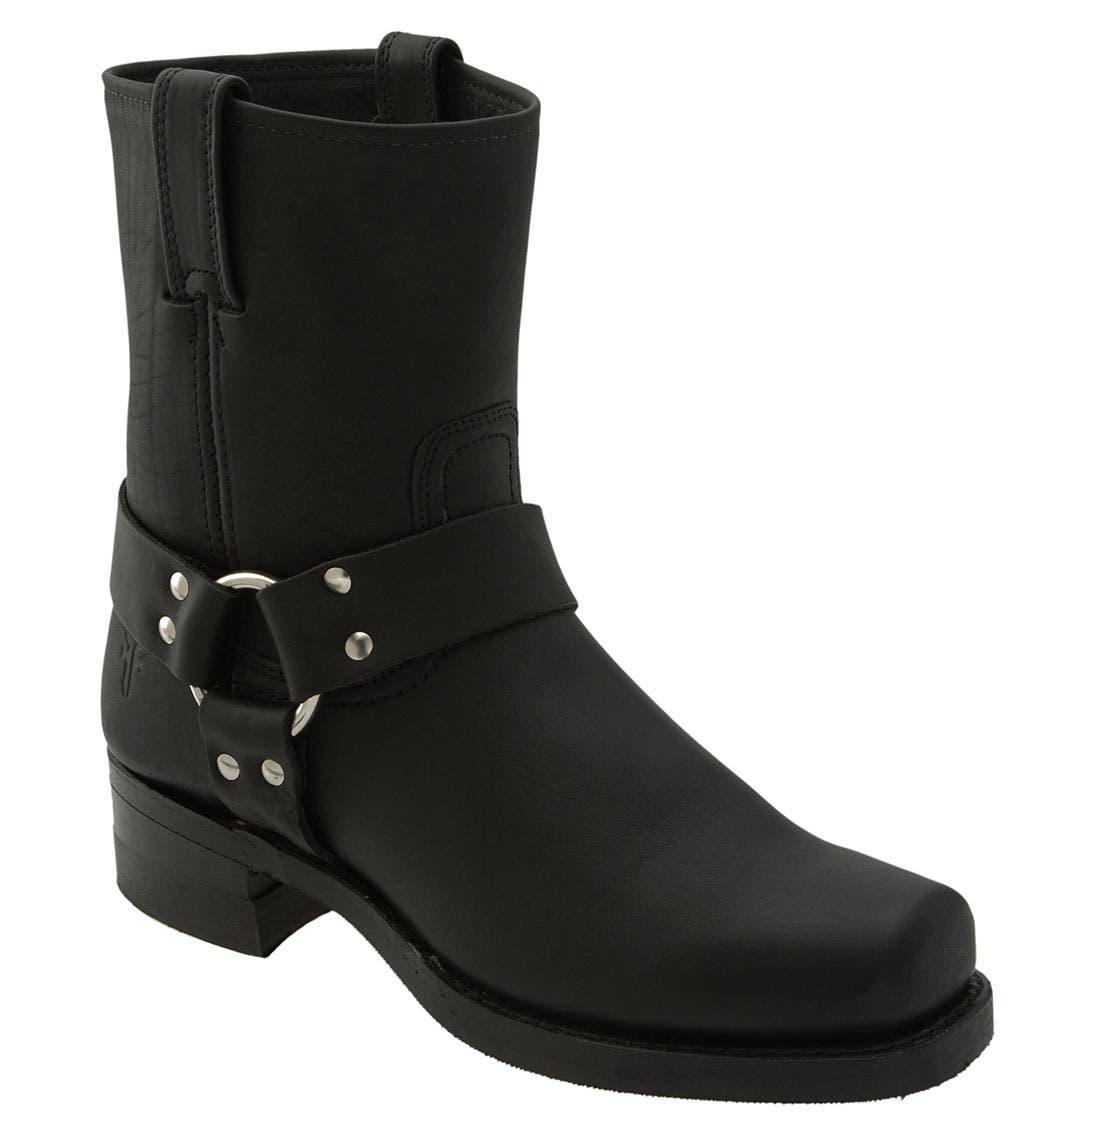 Alternate Image 1 Selected - Frye 'Harness 8R' Boot (Men)